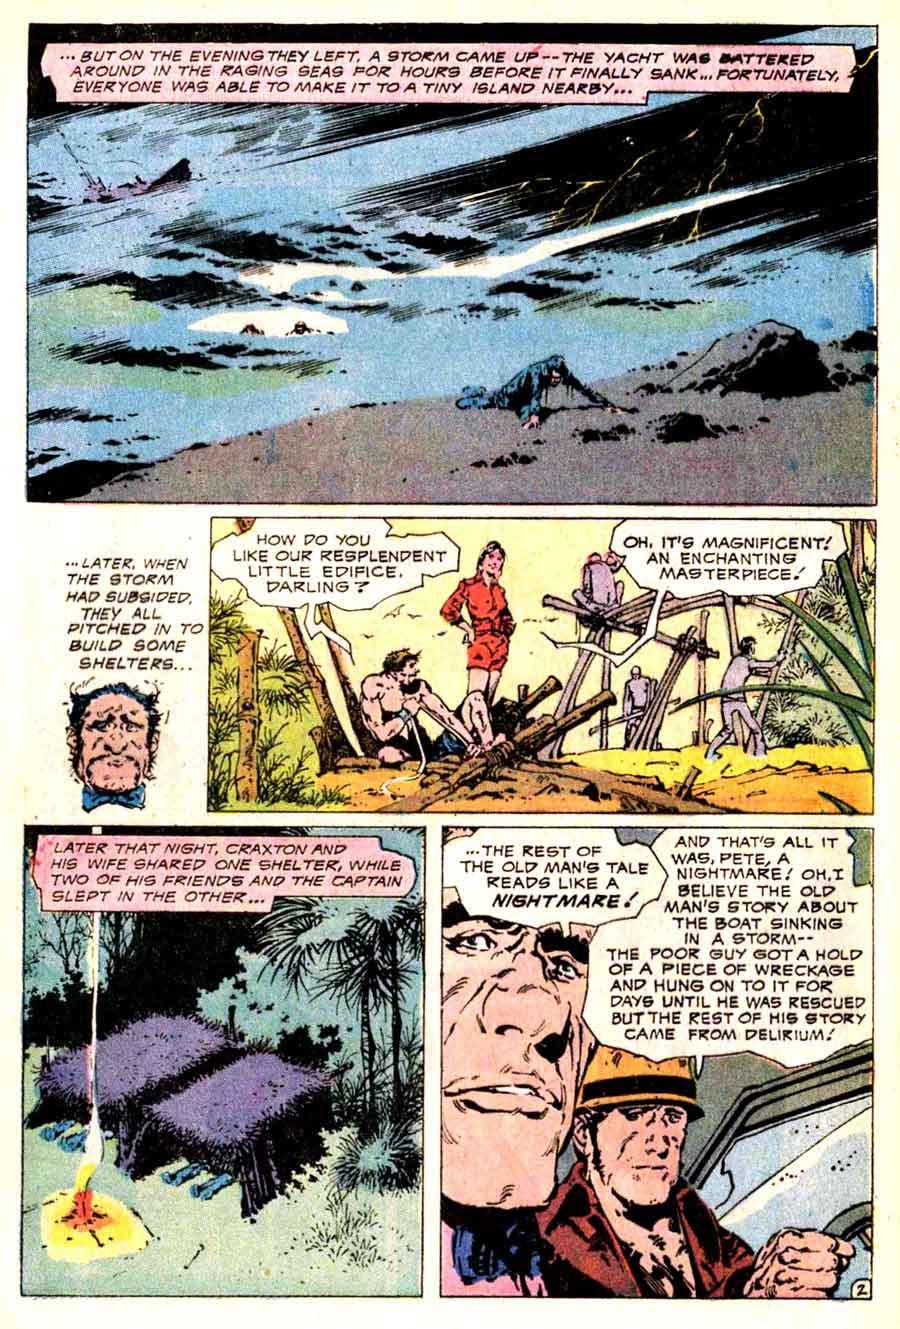 Alex Nino dc bronze age horror 1970s comic book page art - House of Secrets #106